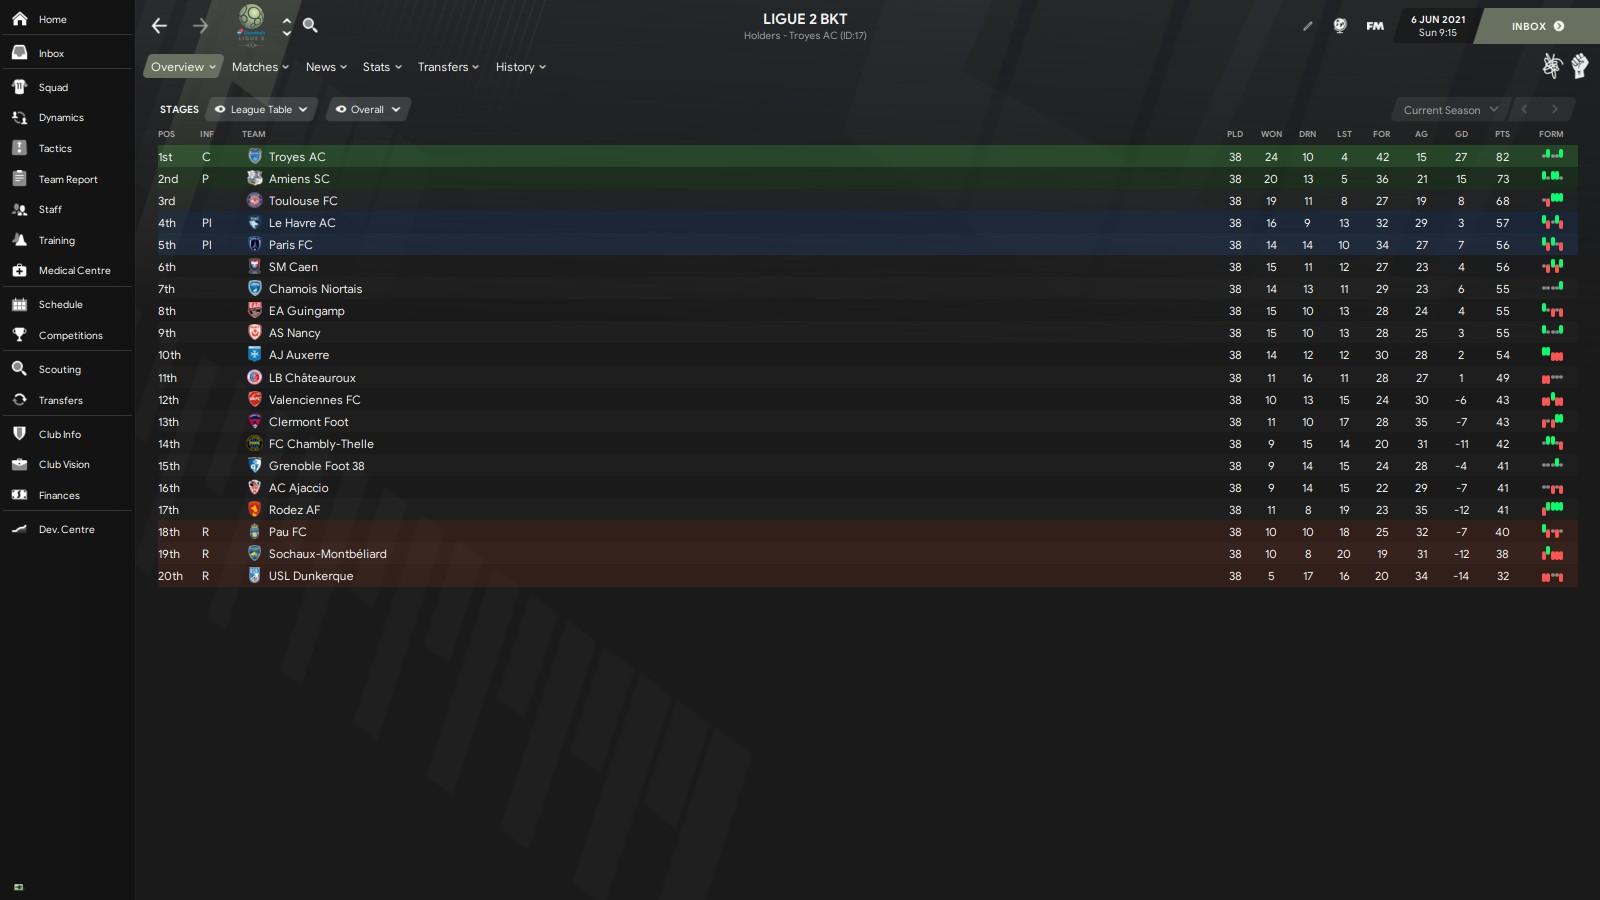 Ligue 2 20-21.jpg